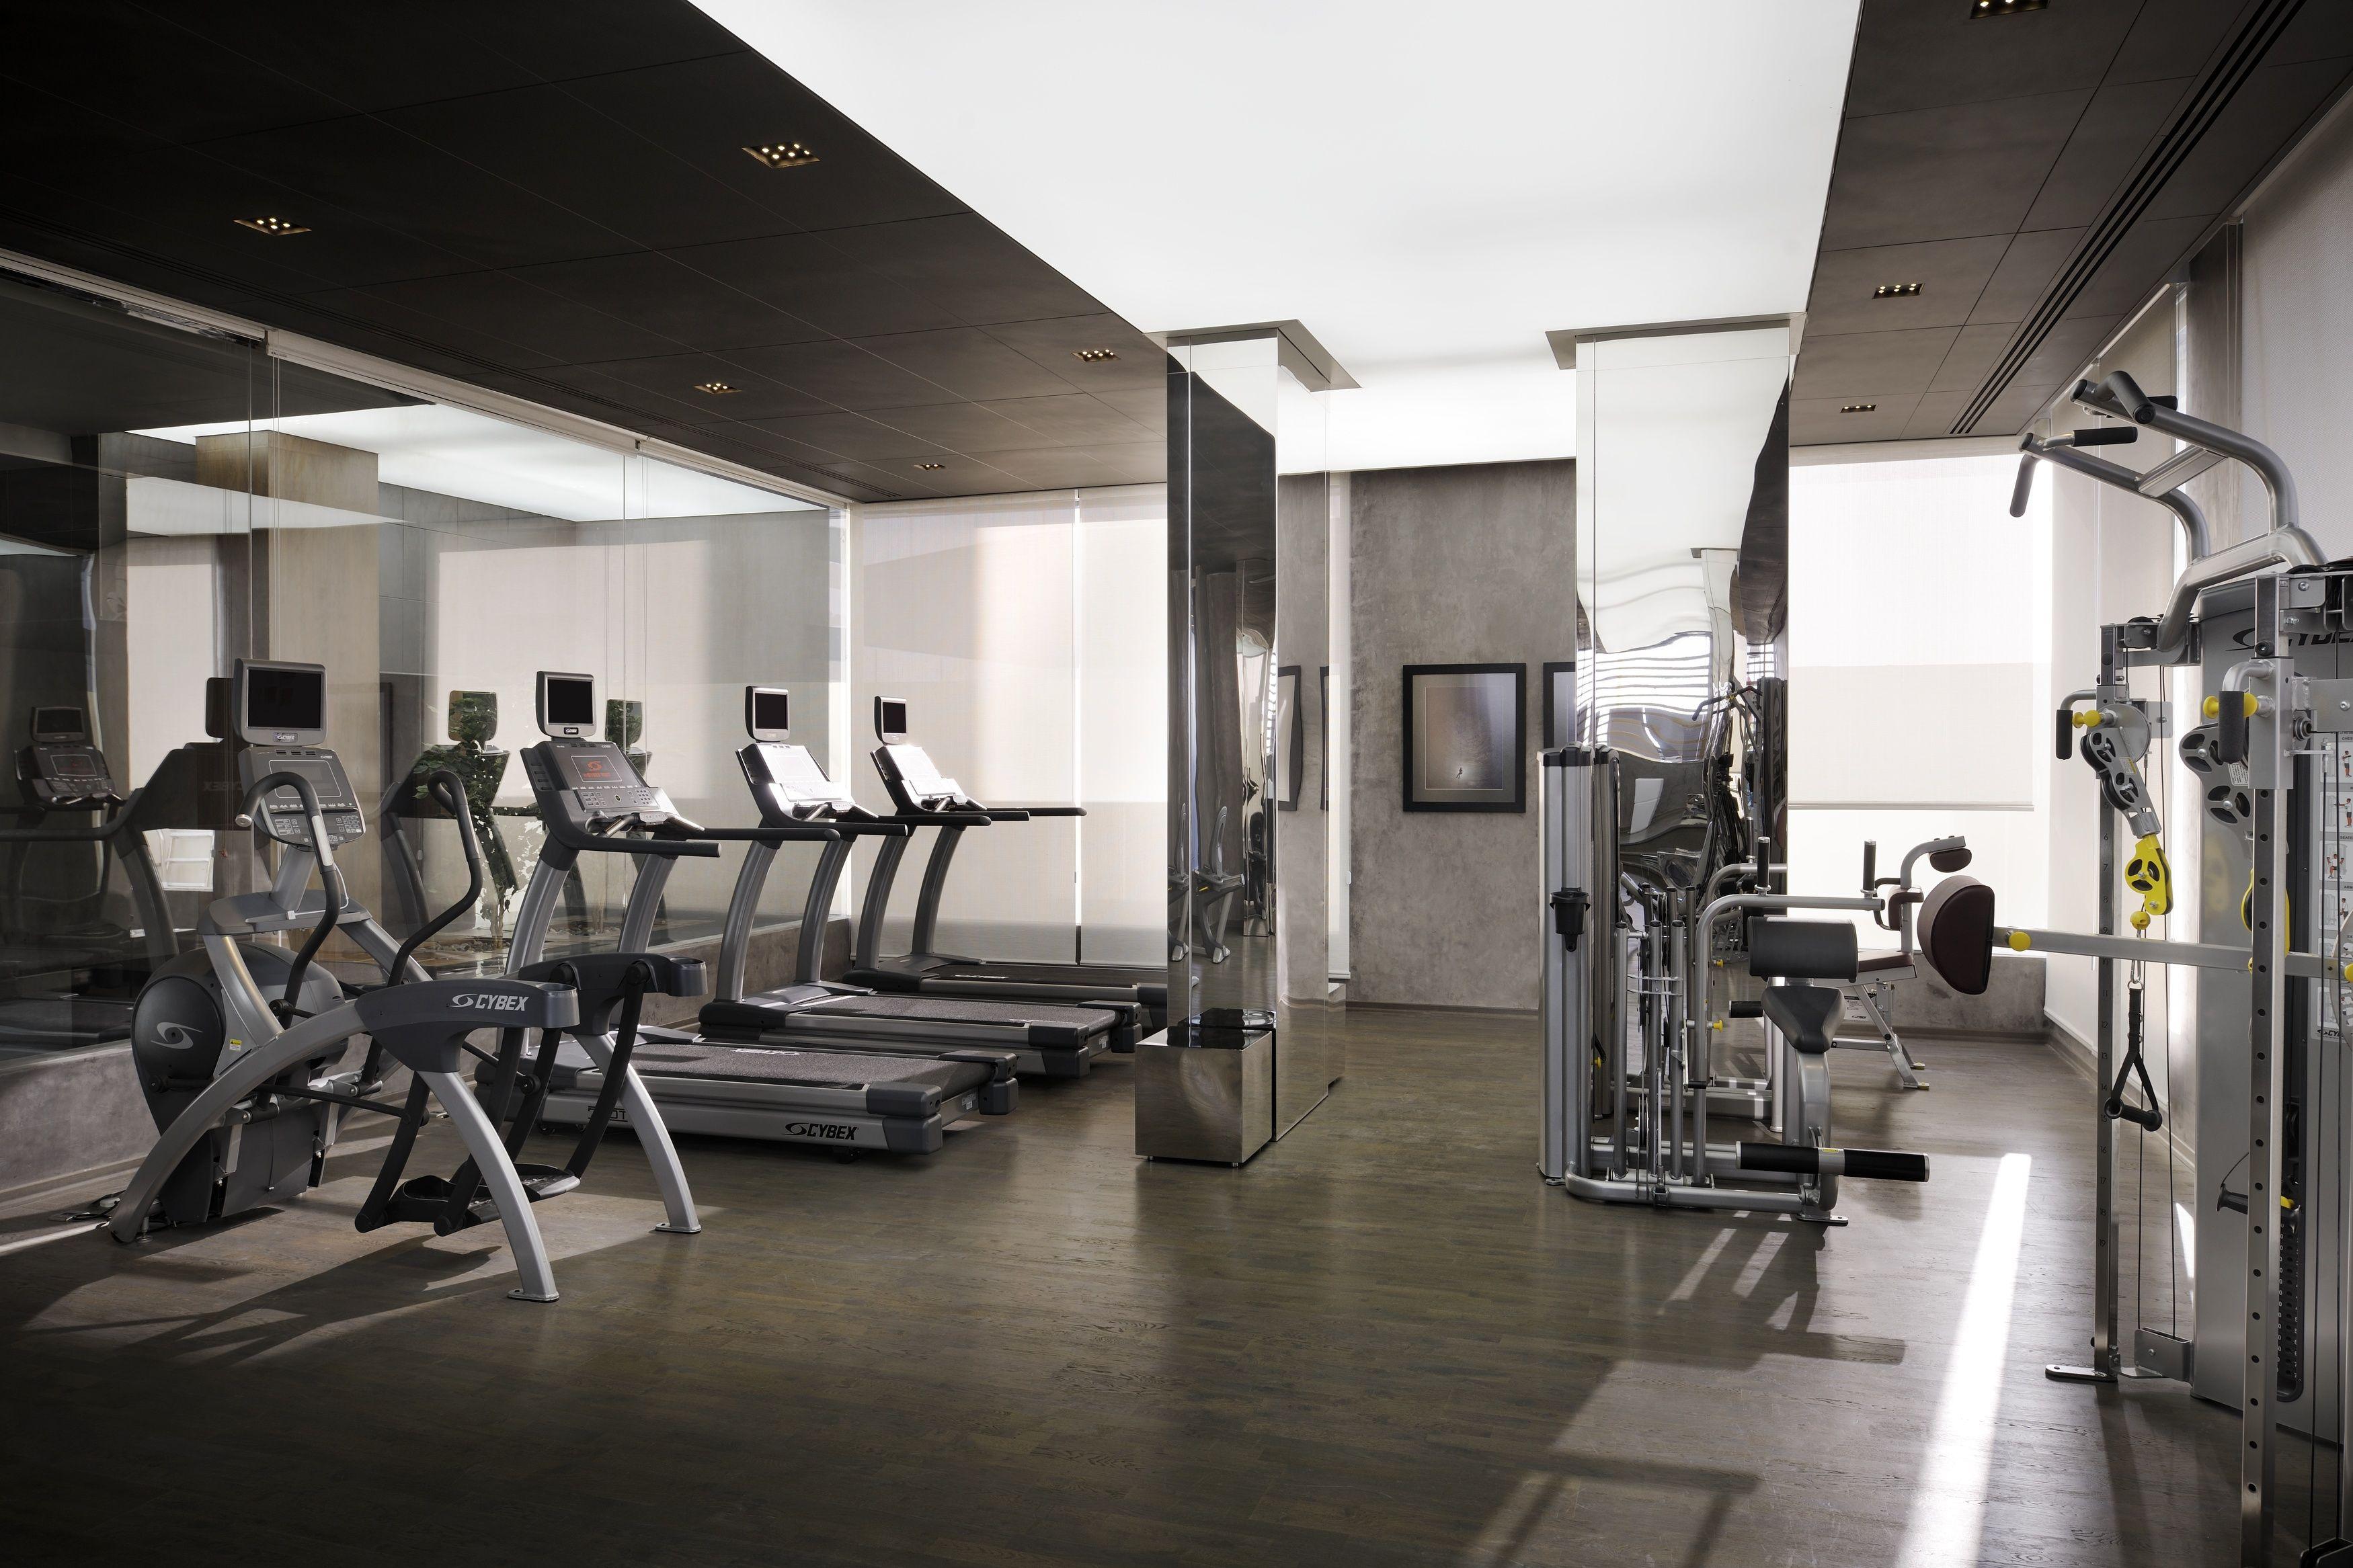 Hotel gym | Radisson Royal, 5 star hotel in Dubai | Pinterest ...